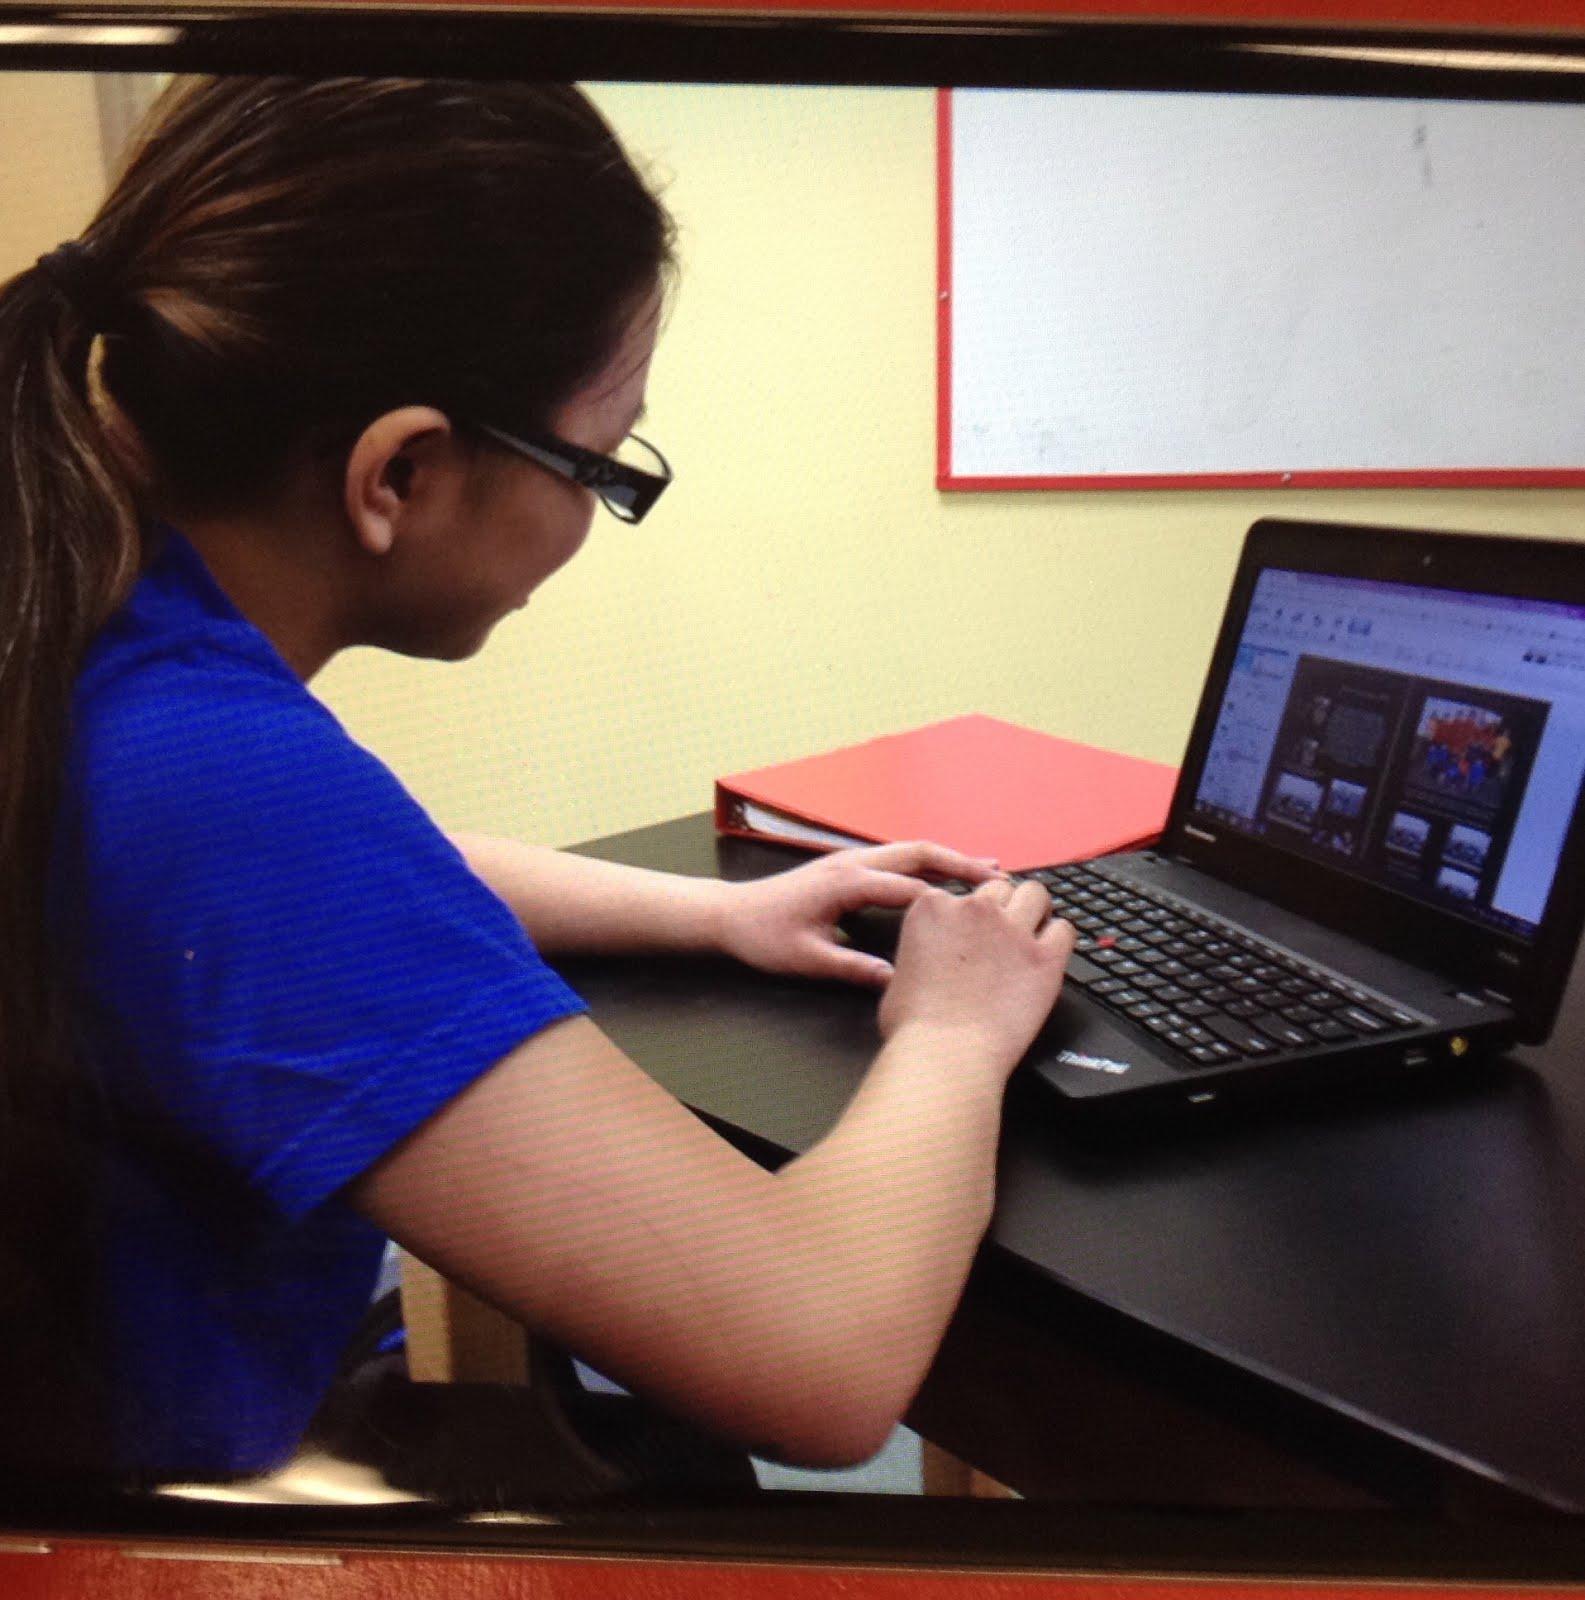 Dayton Stem School: Dayton Regional STEM School News And Events: A Look Behind